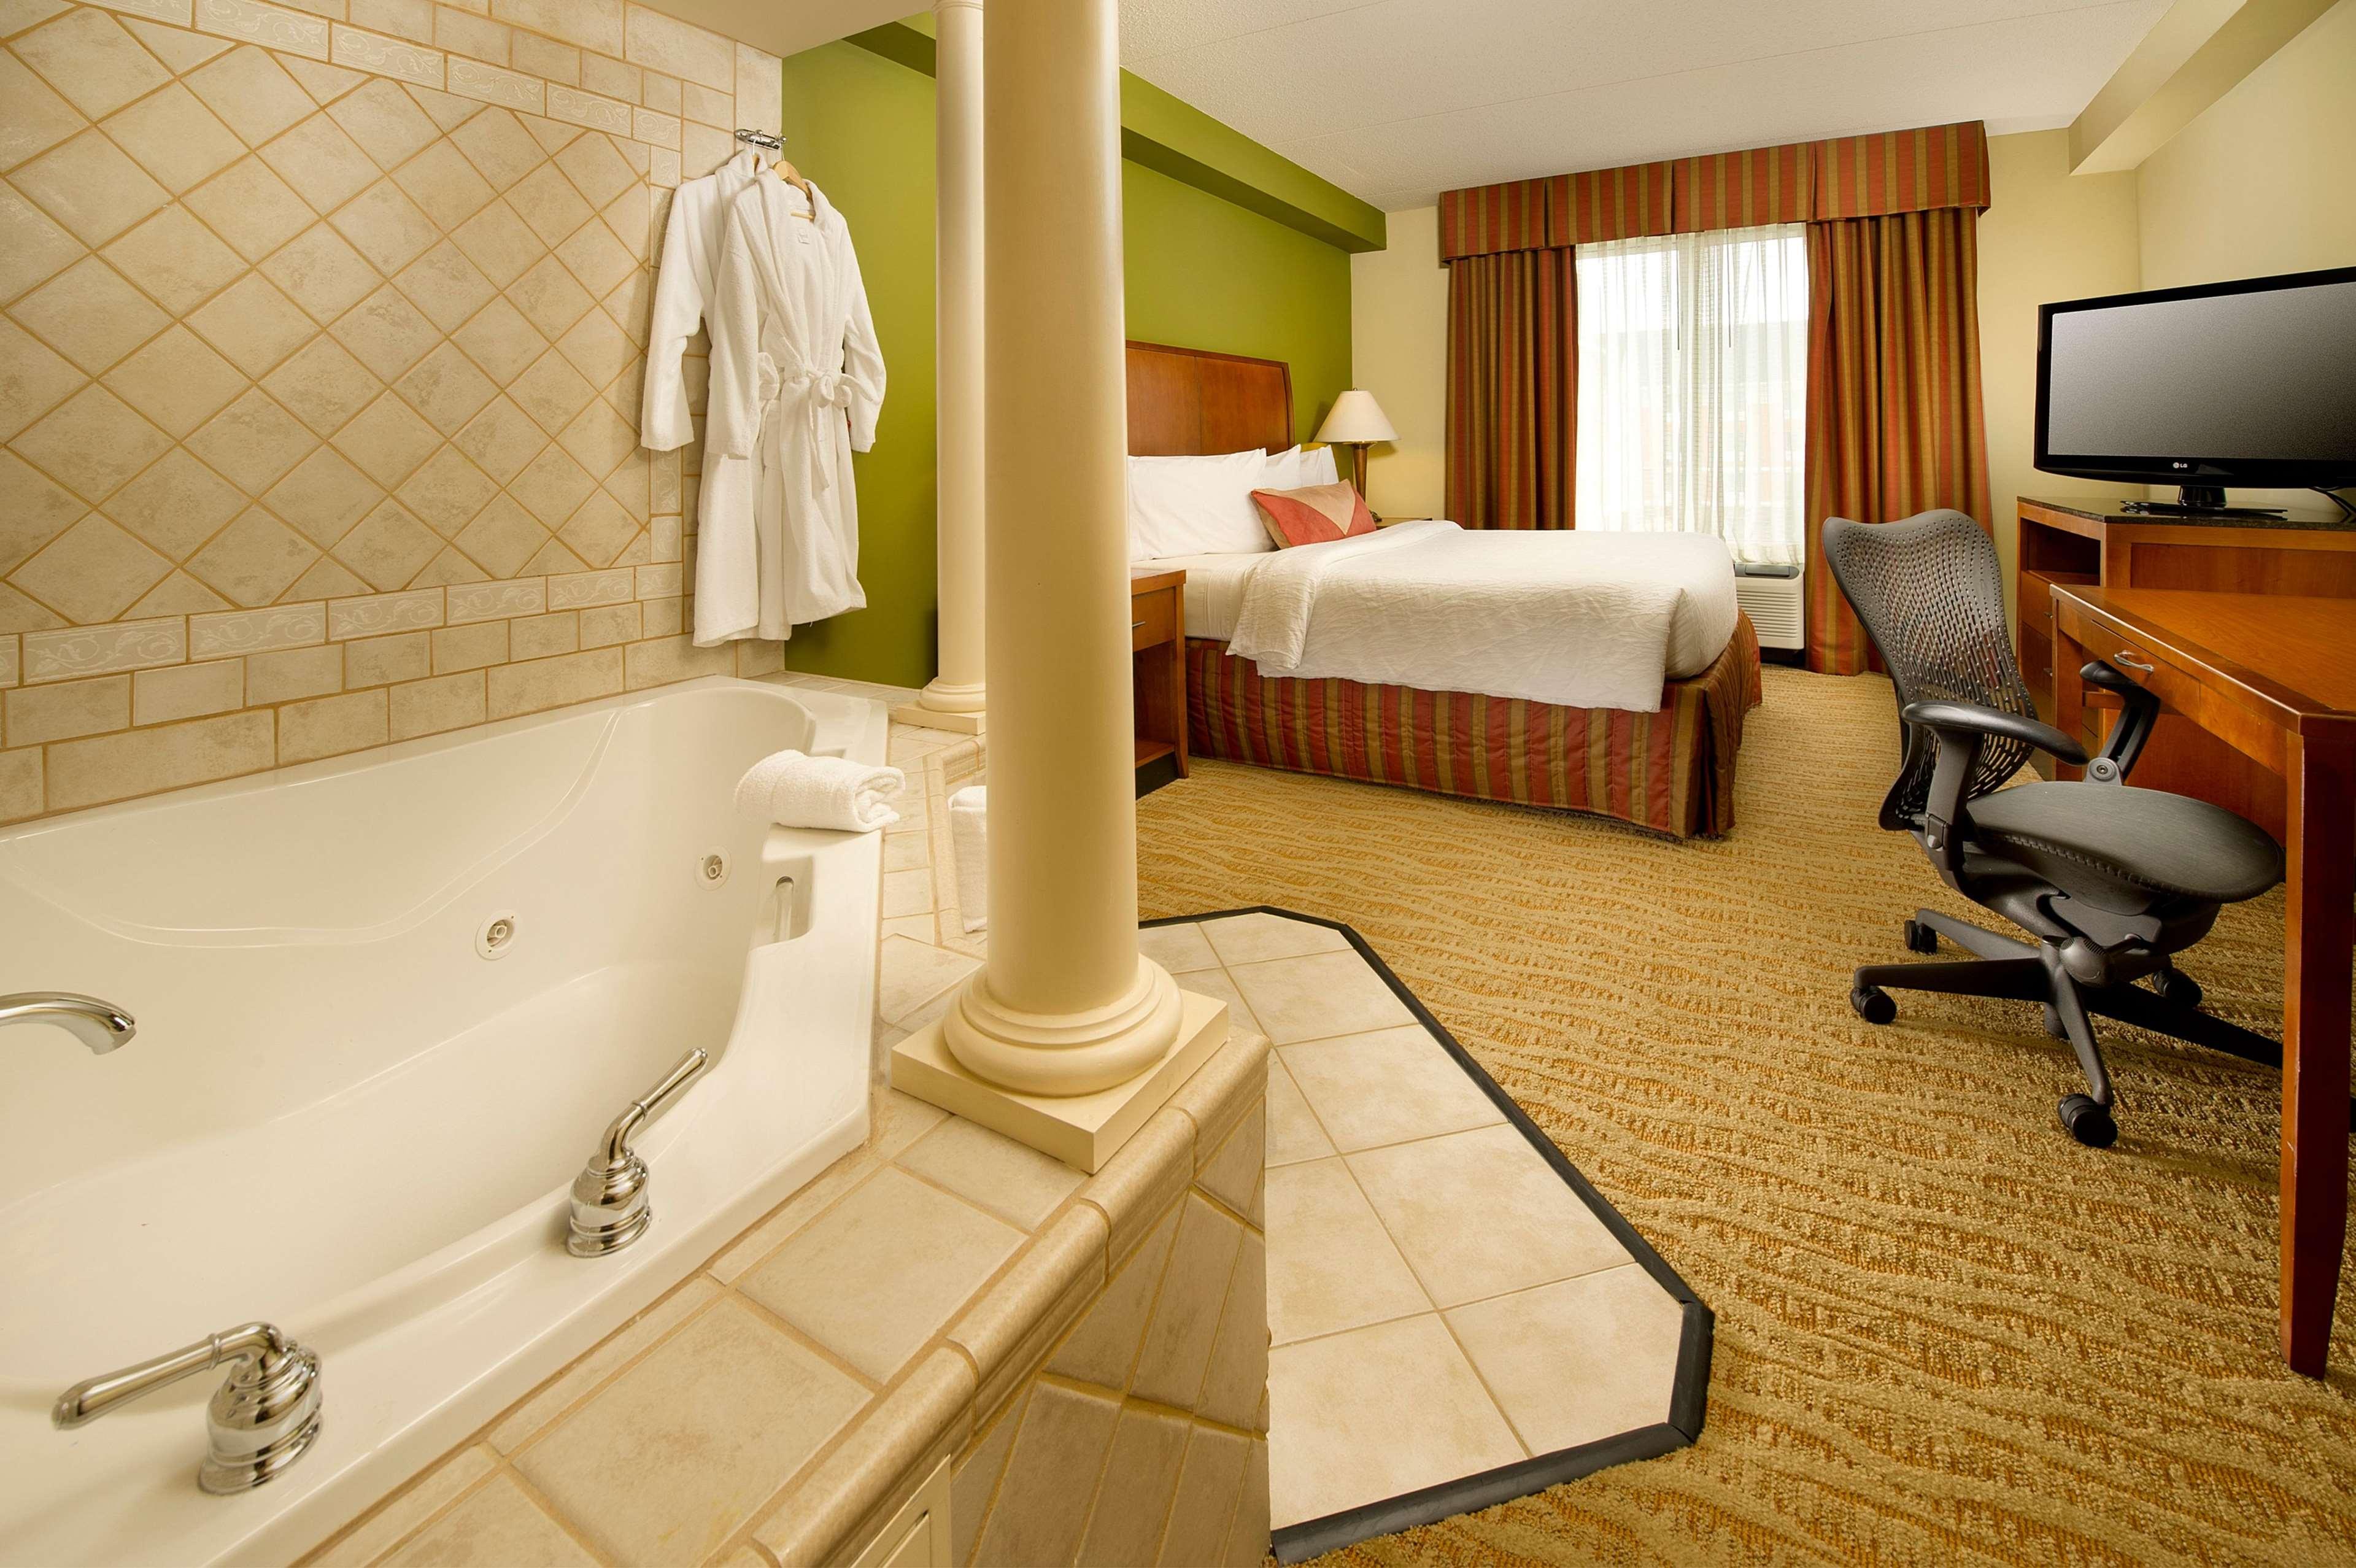 Hilton Garden Inn Atlanta NW/Kennesaw Town Center image 8